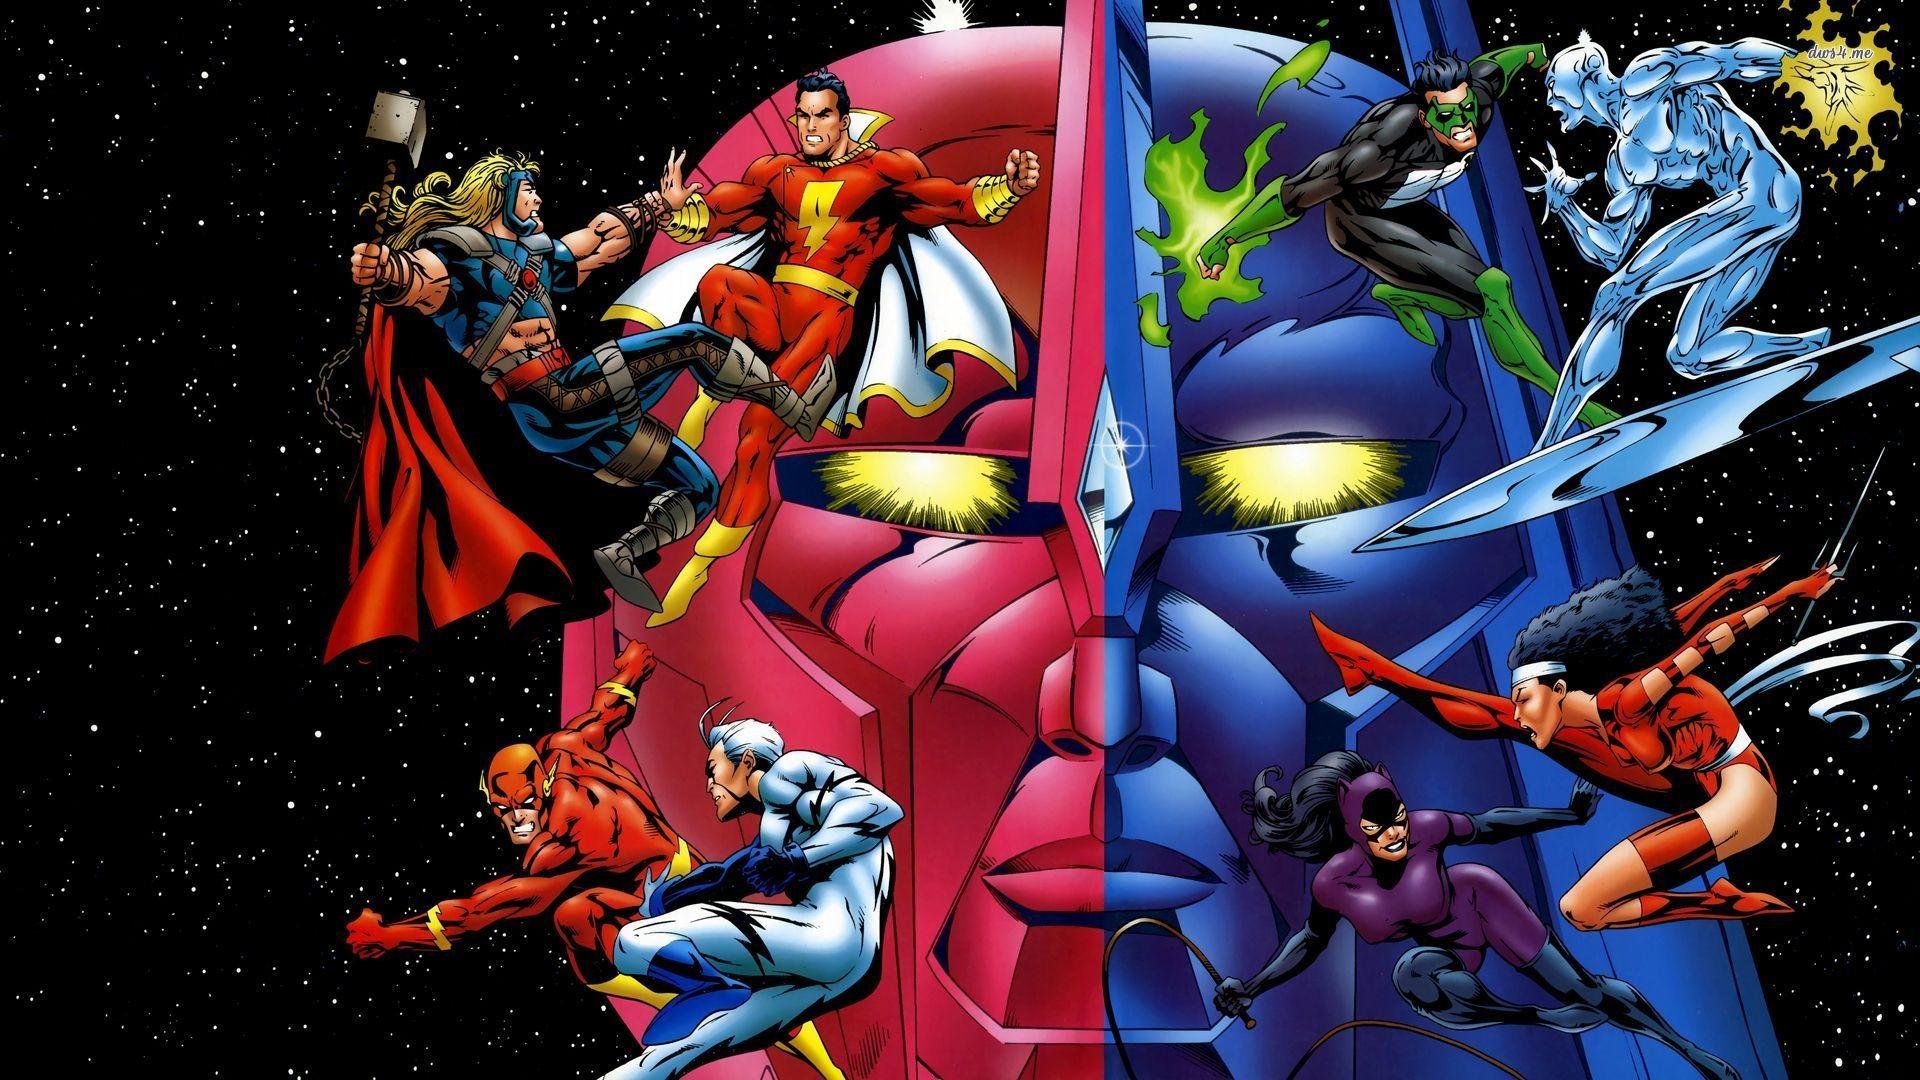 Widescreen Wallpapers of Marvel Vs Dc, Adorable Wallpaper